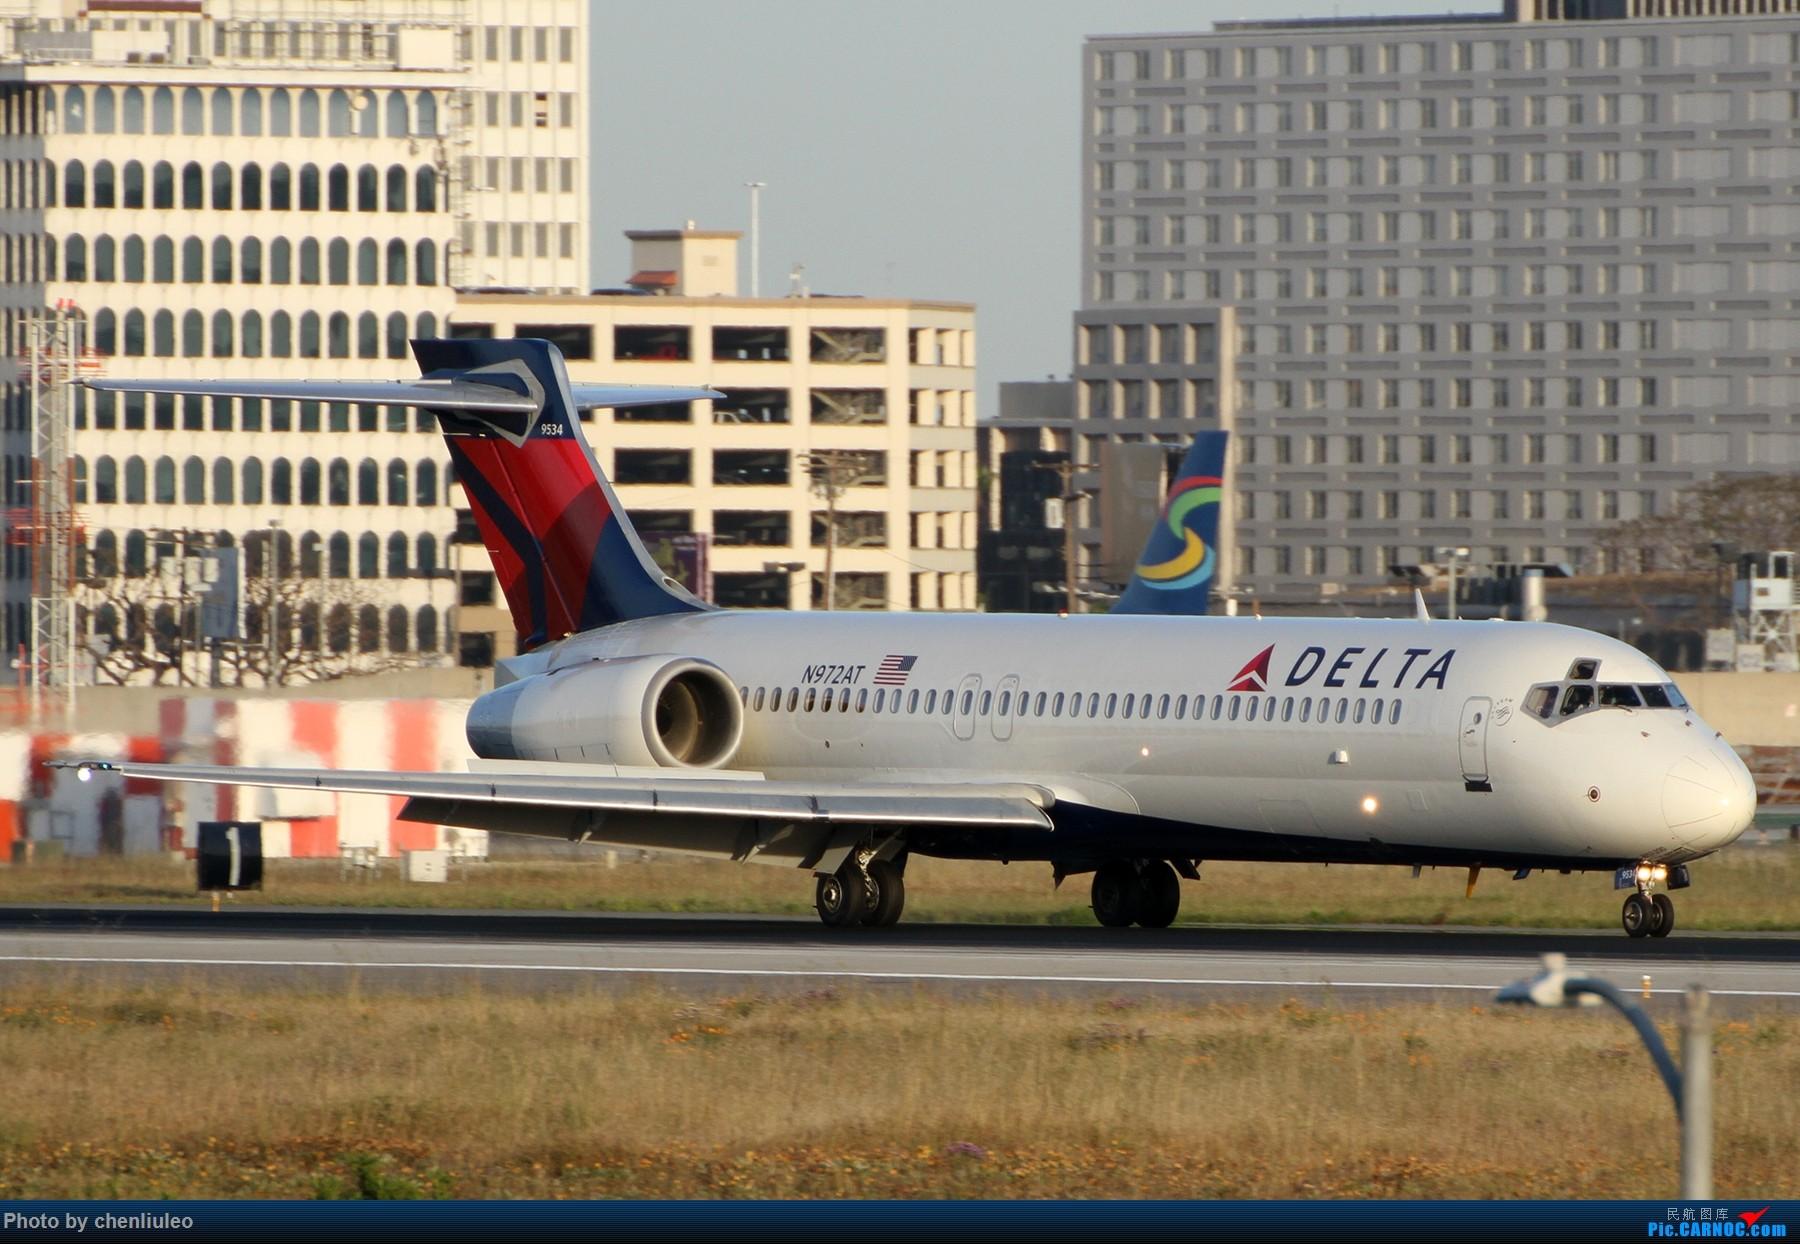 Re:[原创]【北美飞友会】洛杉矶世界机场黄昏随拍 BOEING 717-200 N972AT 美国洛杉矶机场